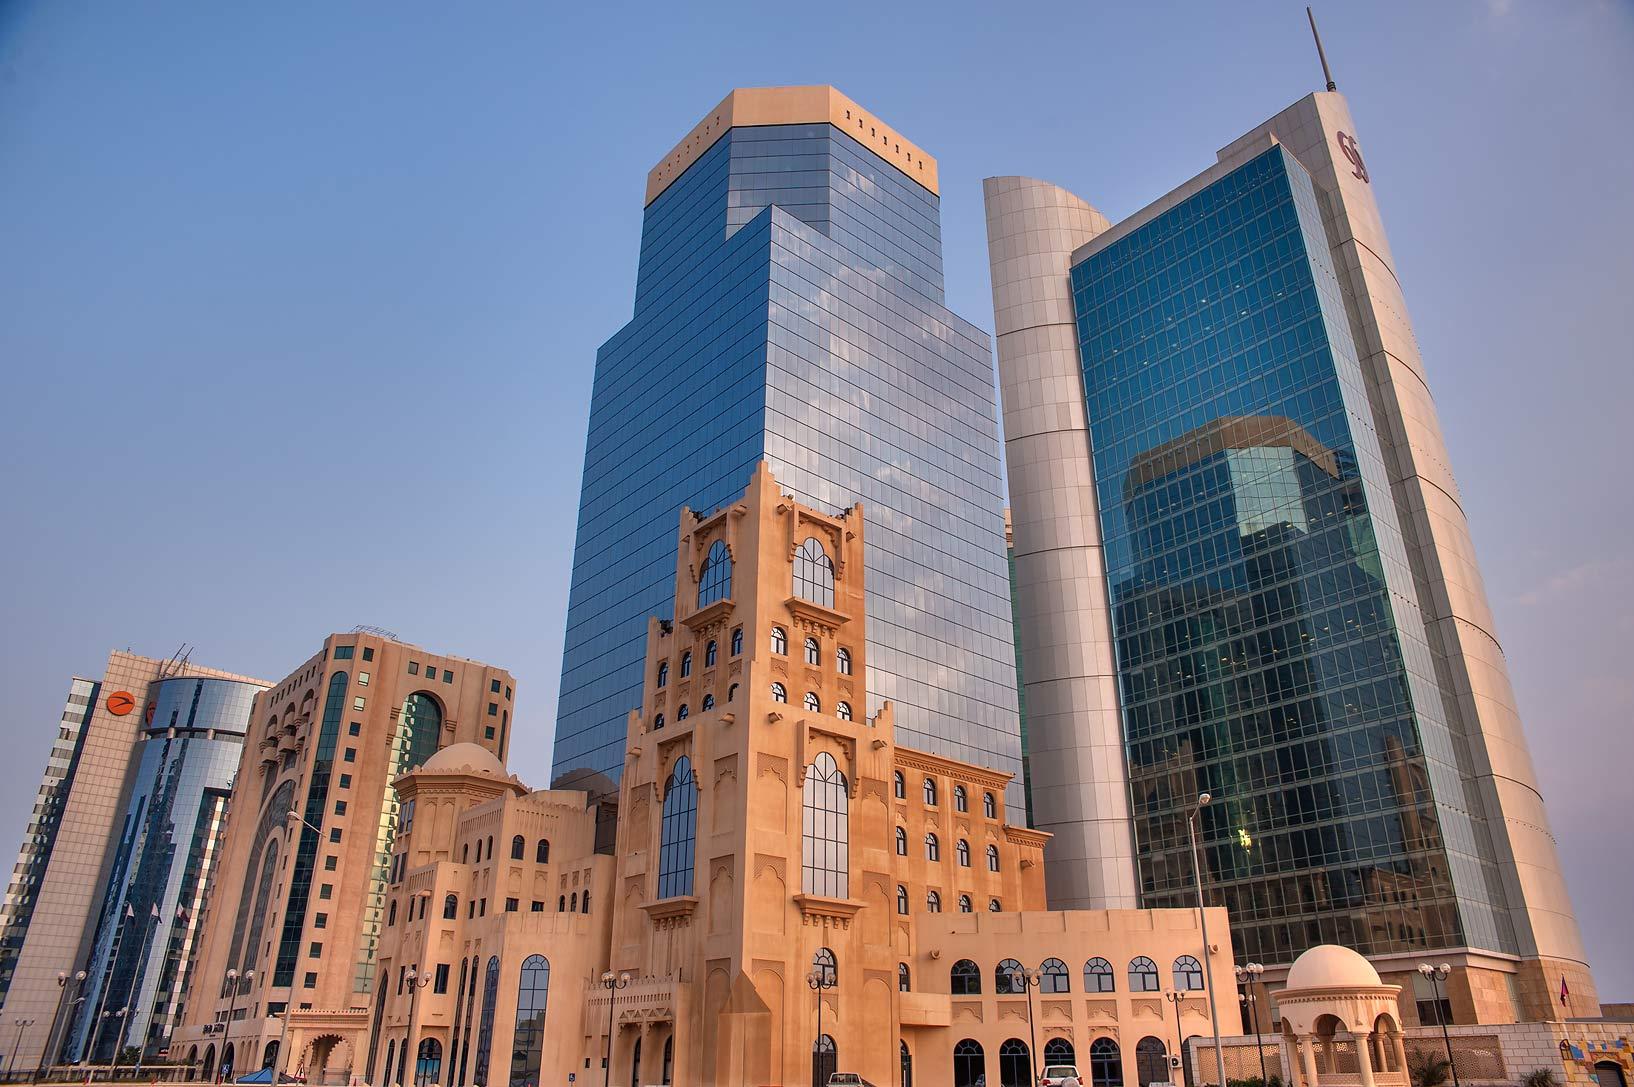 photo 133703 barzan tower on majlis al taawon st in